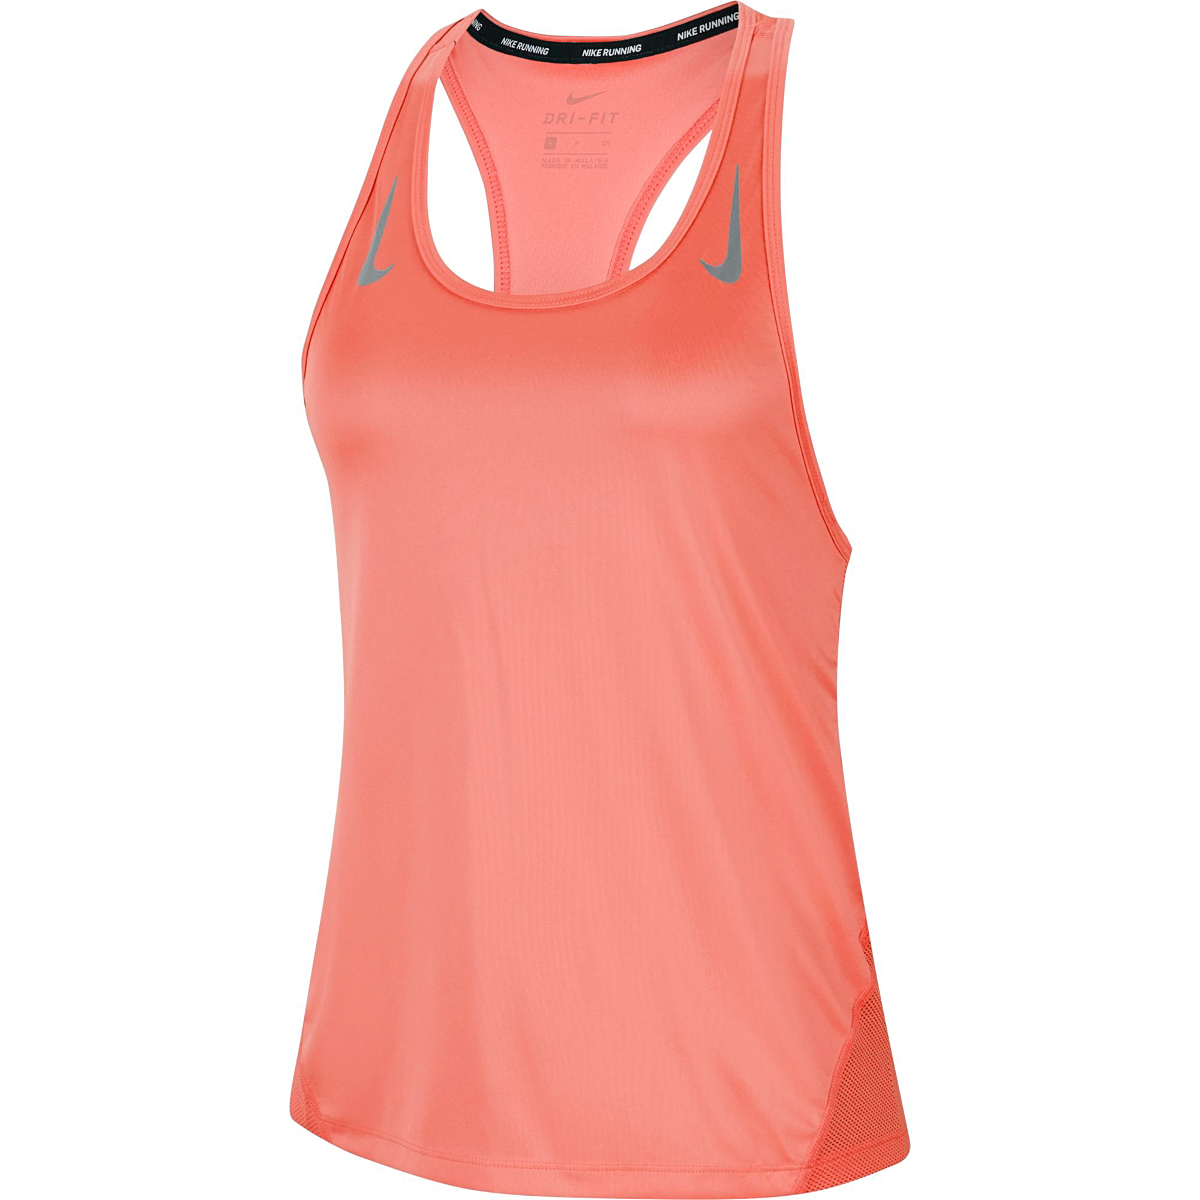 Women's Nike Miler Women's Running Singlet - Color: Bright Mango/Reflective - Size: L, Bright Mango/Reflective, large, image 1